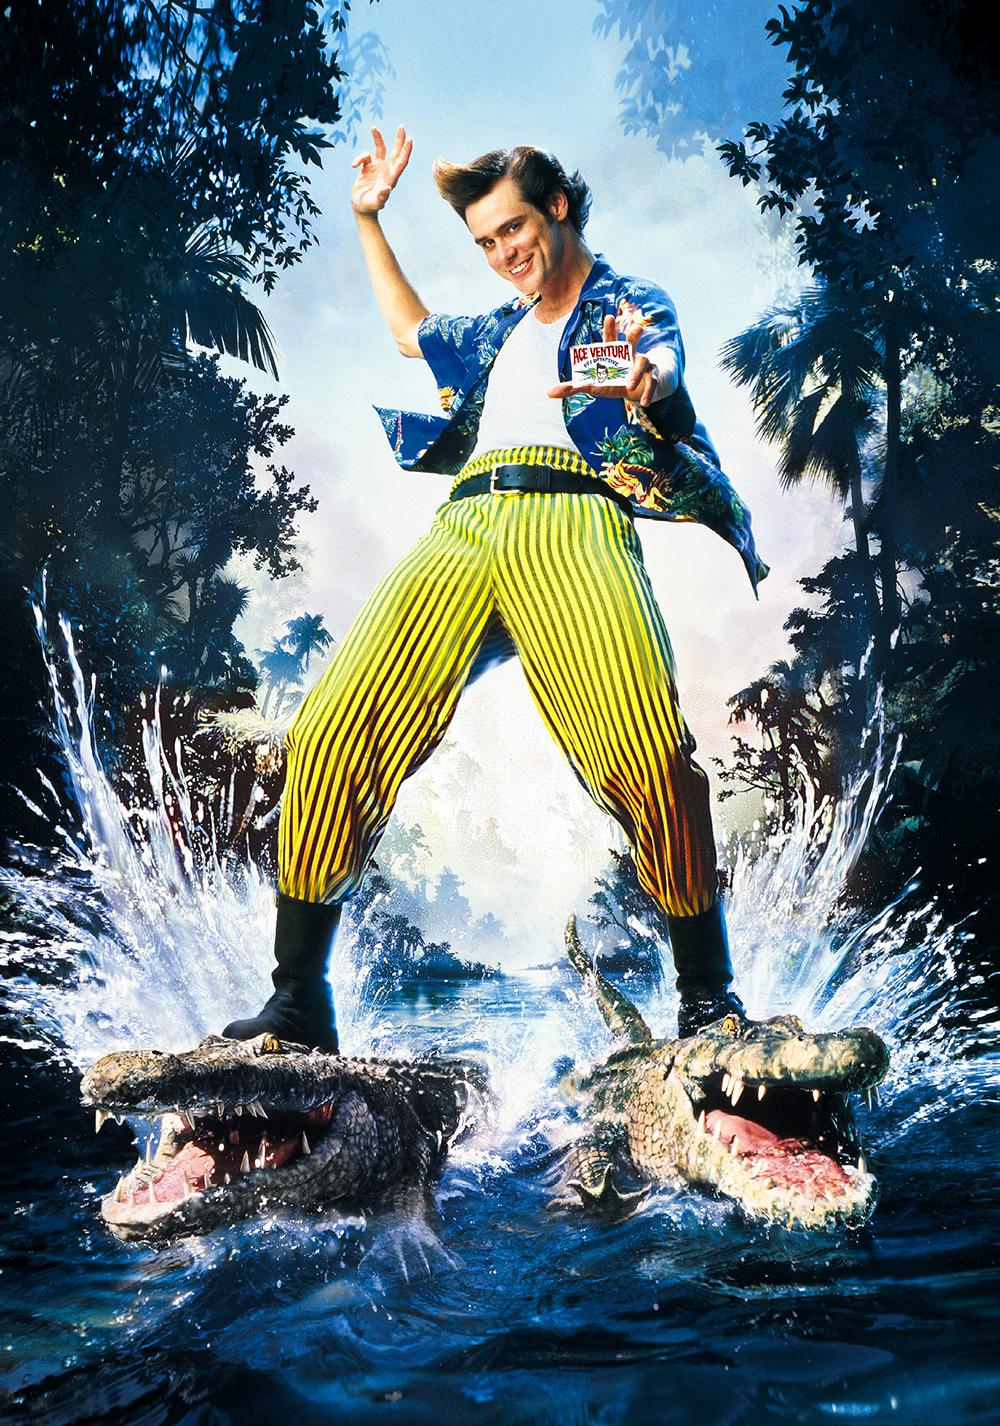 Download Ace Ventura: When Nature Calls full hd movie torrent